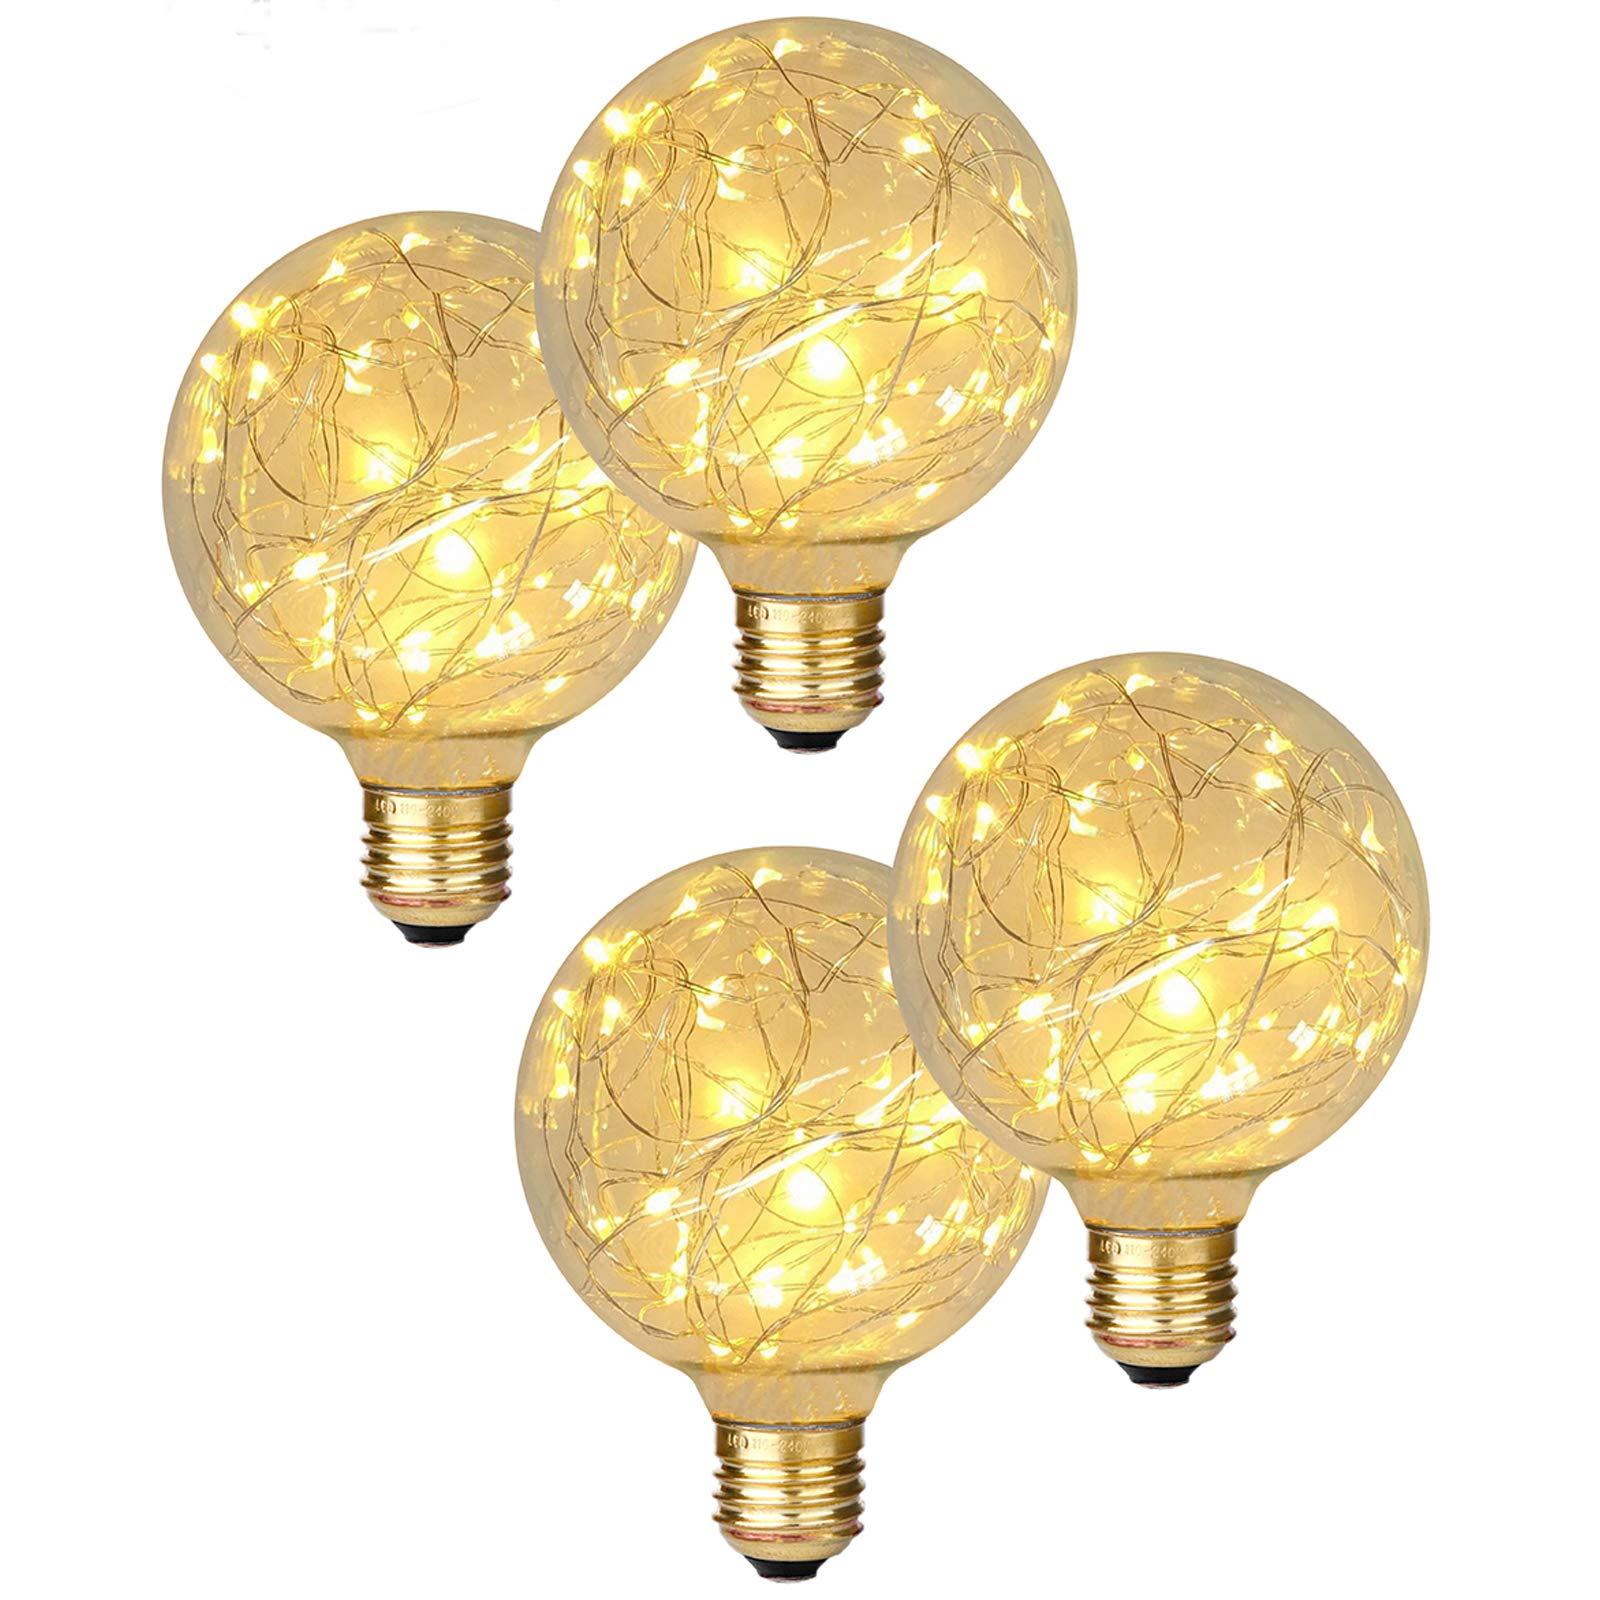 Mua Beilf Copper Wire String Globe Led Fairy Light Bulb G30 G95 E26 Base 2w Soft Warm White 2200k Specialty Bulbs For Decorating 4 Pack Trên Amazon Mỹ Chính Hãng 2021 Fado